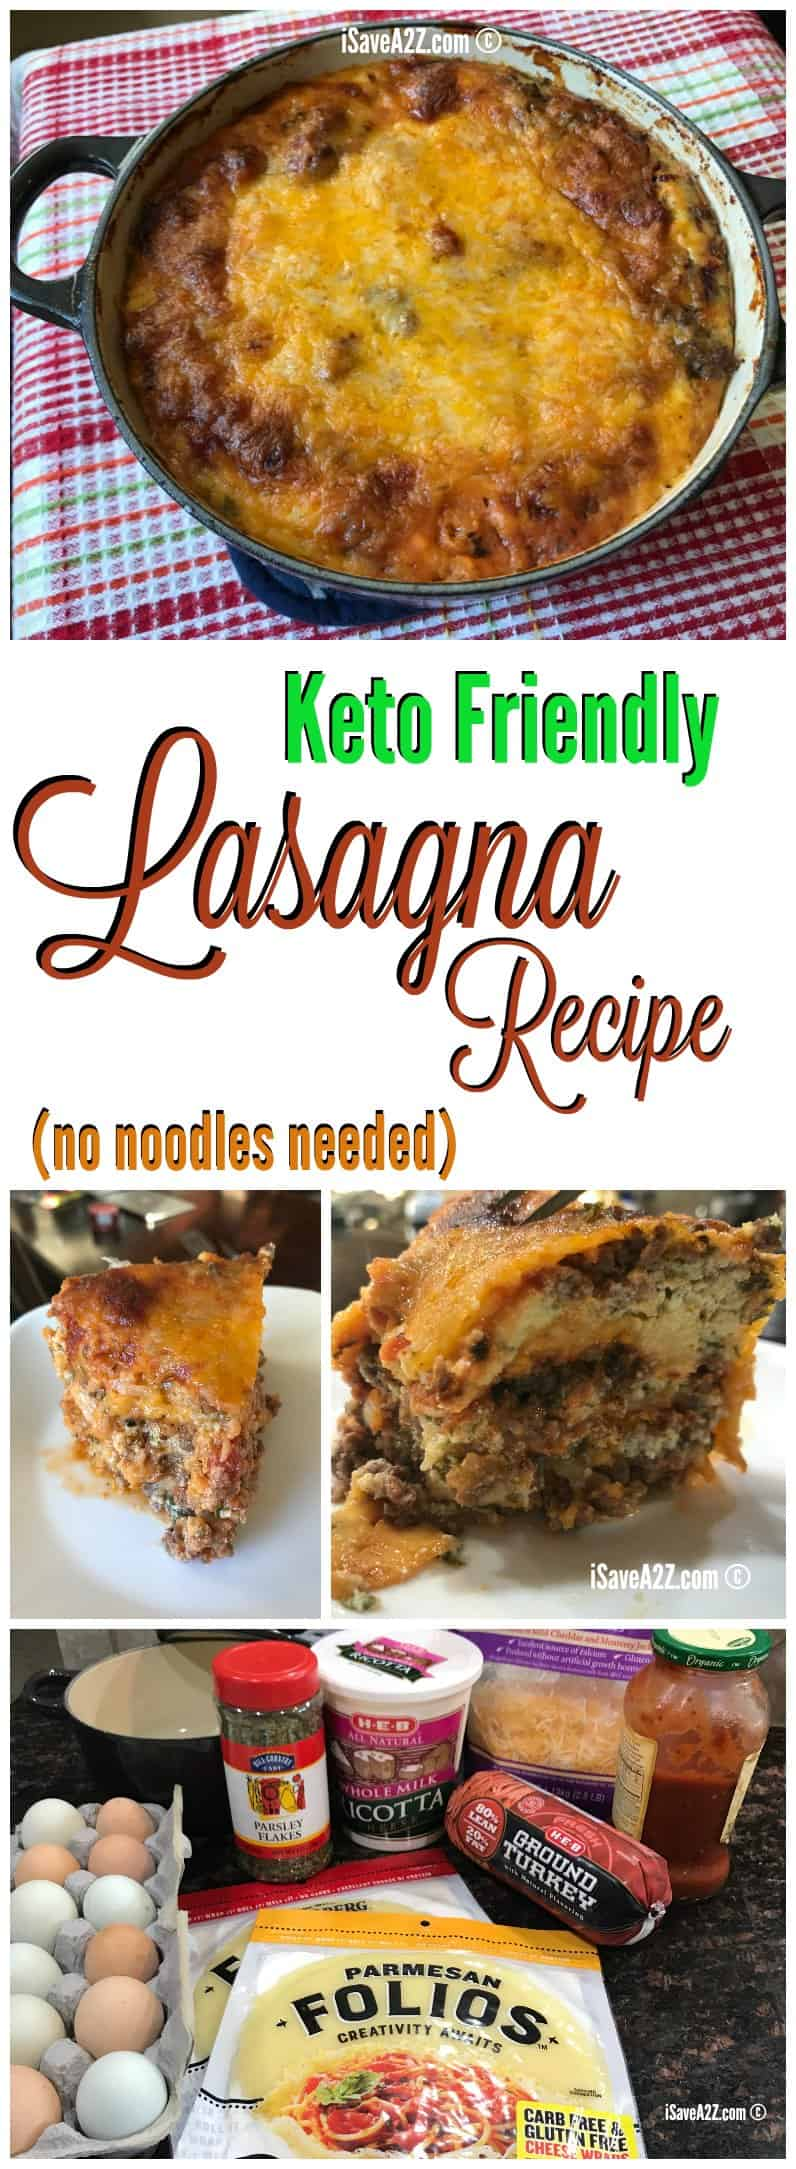 Keto Lasagna Recipe (made with no noodles)